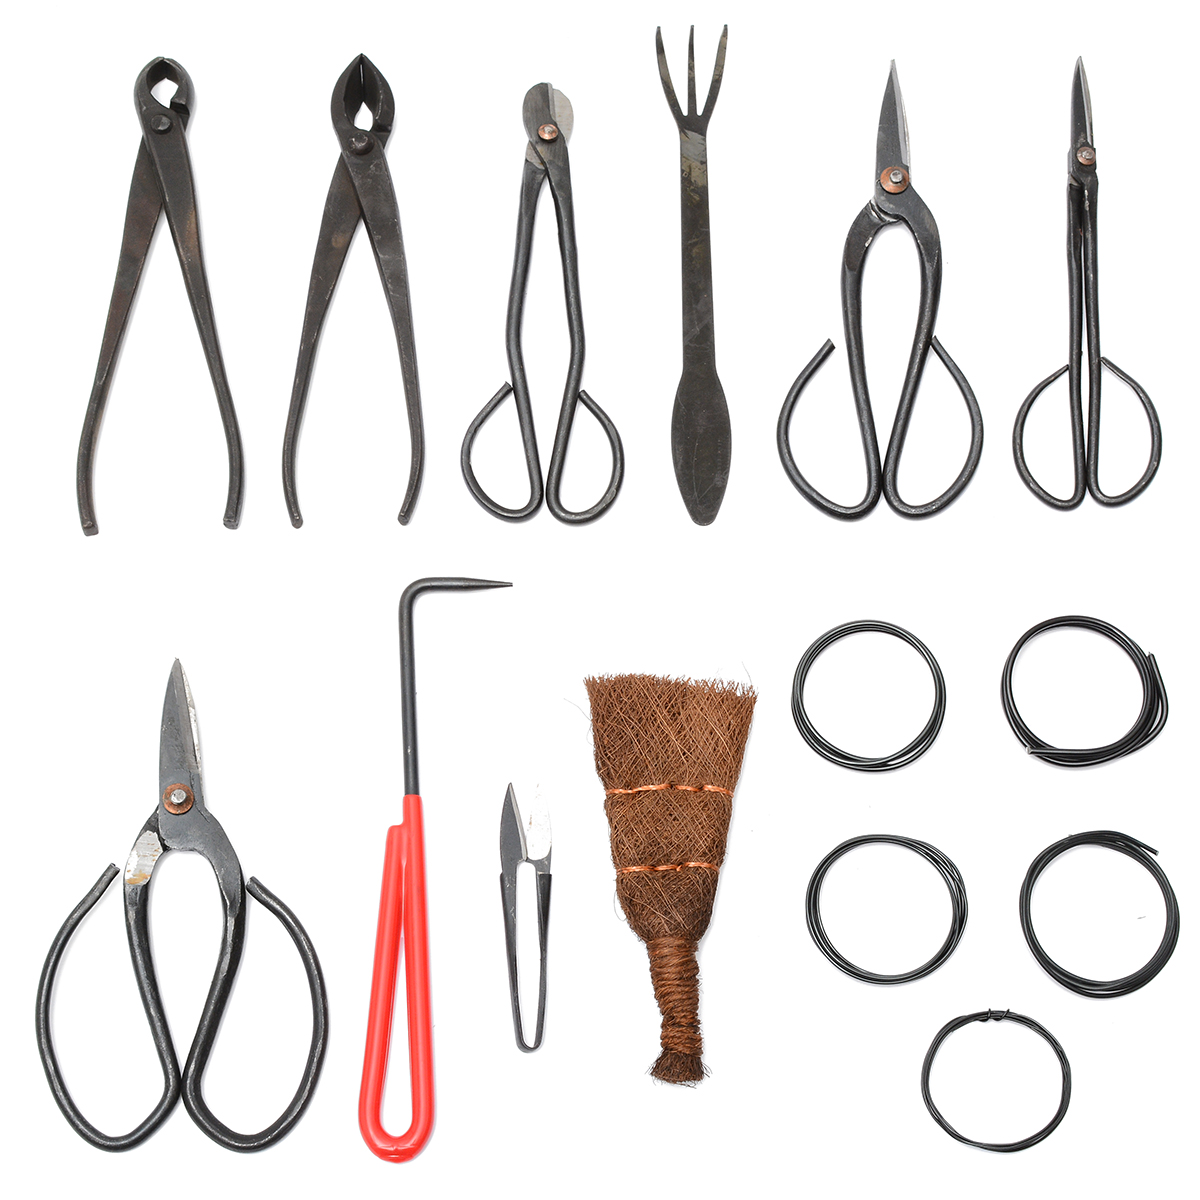 10Pcs Garden Pruning Shear Bonsai Tool Set Carbon Steel Extensive Cutter Scissors Kit With Nylon Case Mayitr